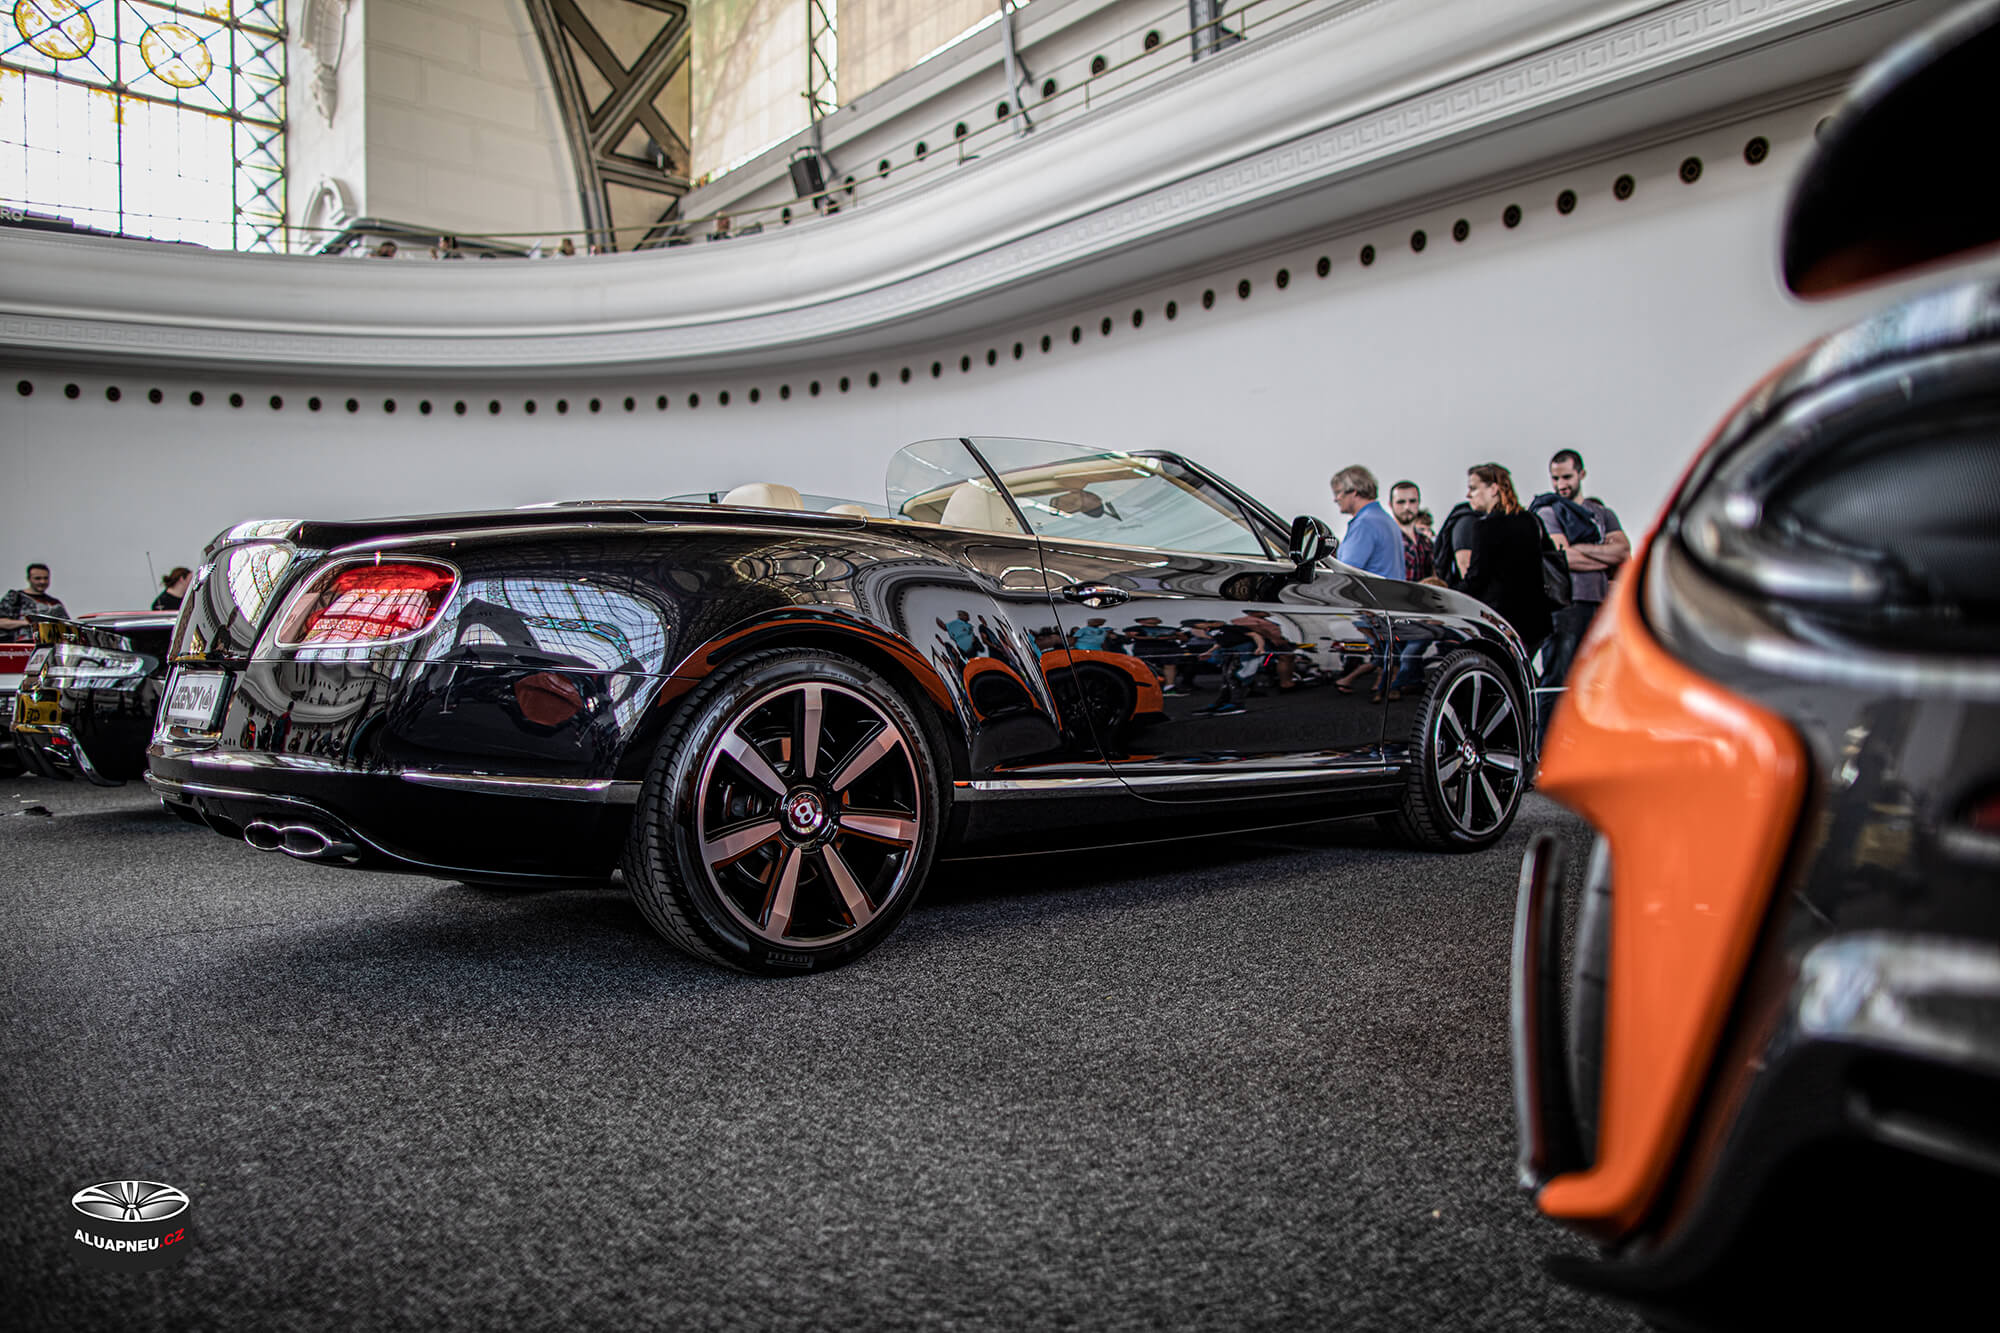 Originální alu kola Bentley Continental - Automobilové Legendy 2019 - www.aluapneu.cz